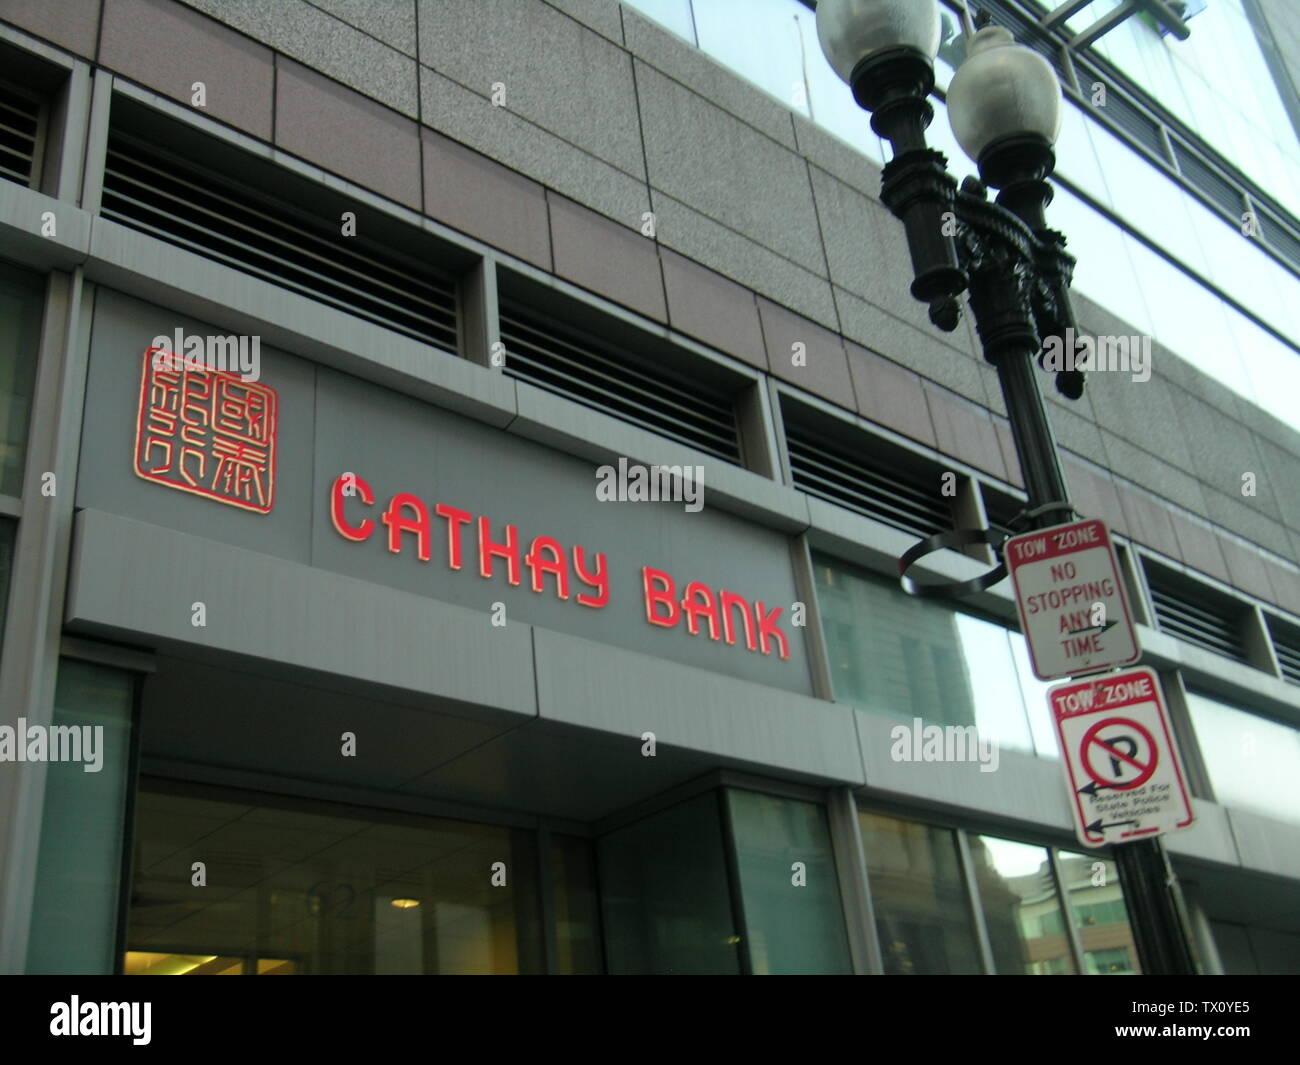 """Inglés: Cathay Bank en Chinatown, Boston, Massachusetts, Estados Unidos. En marzo de 2008 Foto por John Stephen Dwyer 中文(繁體): 波士顿唐人街國泰銀行 中文(简体): 波士顿唐人街国泰银行; 4 de marzo de 2008 (fecha de carga original); trasladado desde en.wikipedia a Commons.; HouseOfScandal en Wikipedia en inglés; ' Imagen De Stock"